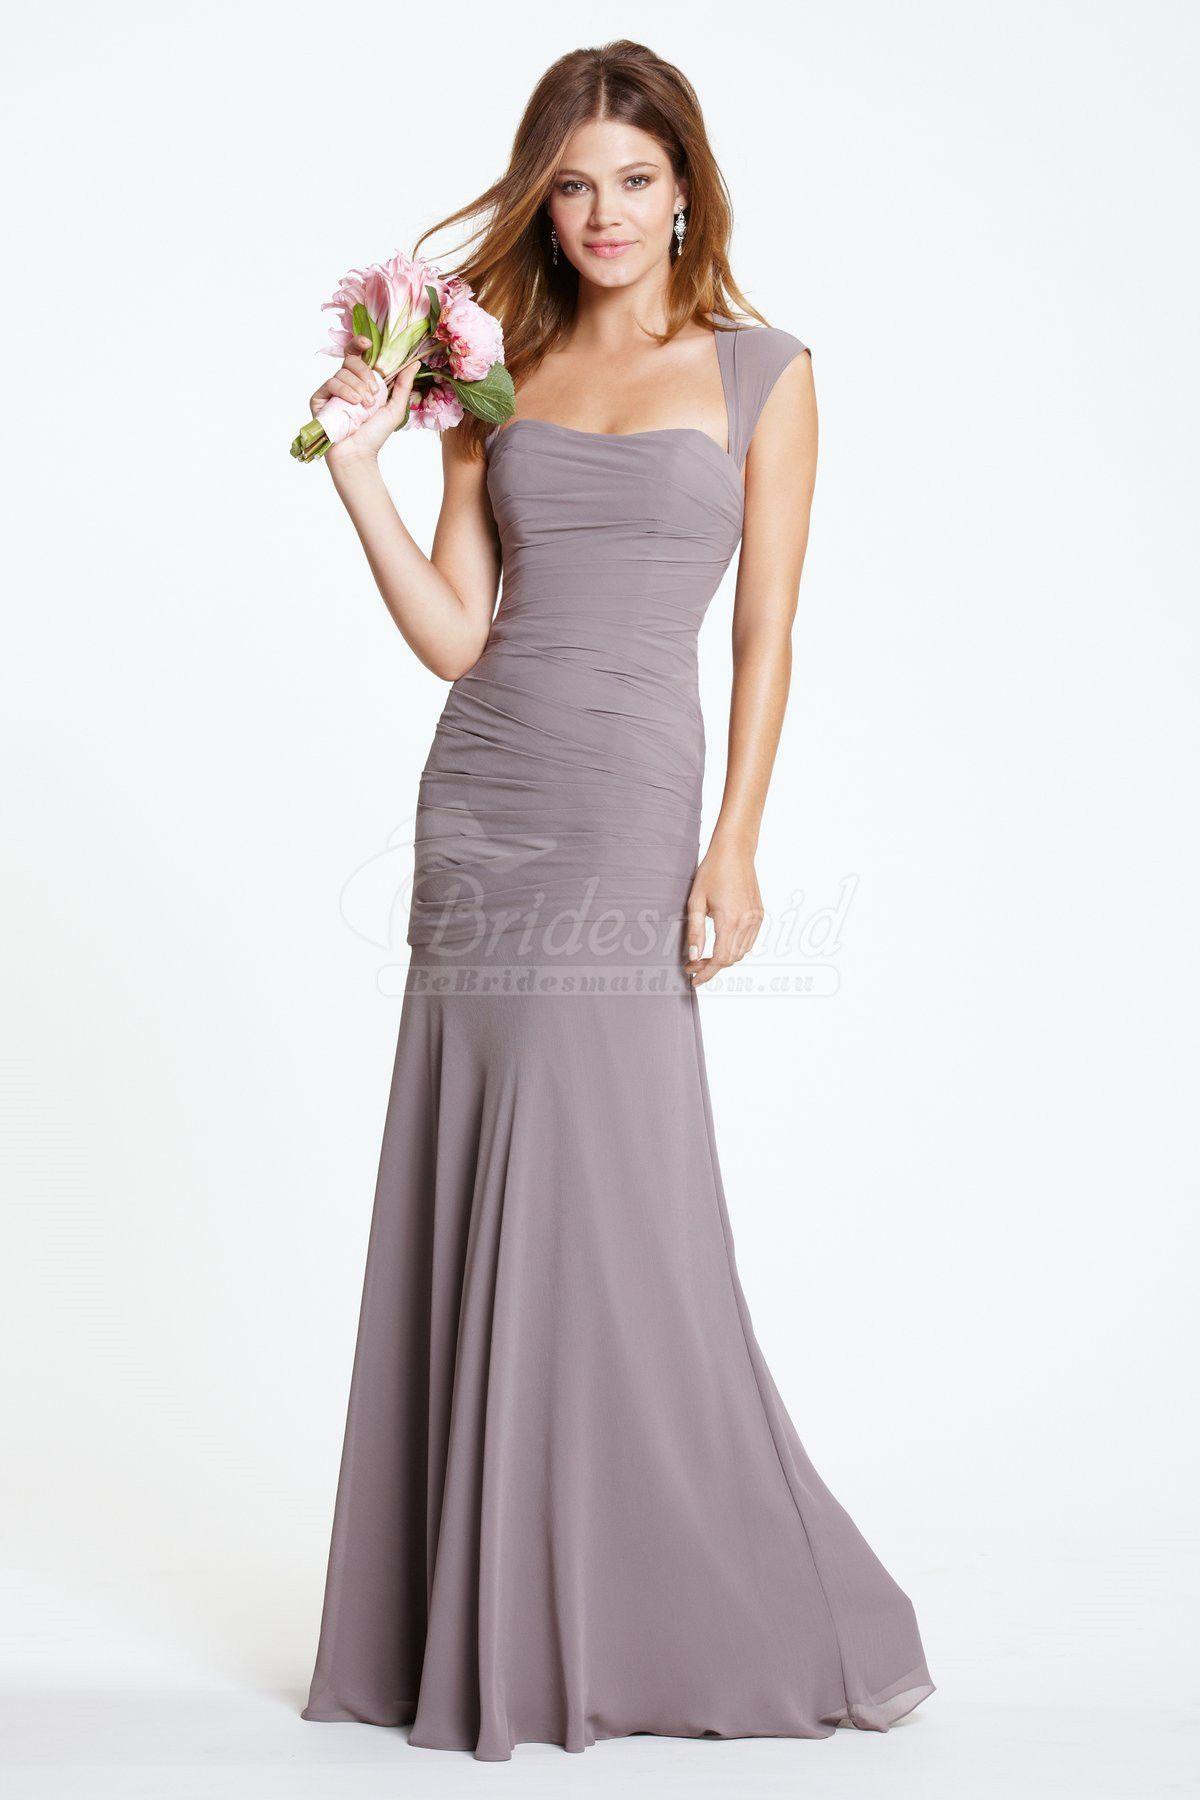 Sweetheart long chiffon bridesmaid dress wedding ideas sweetheart long chiffon bridesmaid dress ombrellifo Choice Image